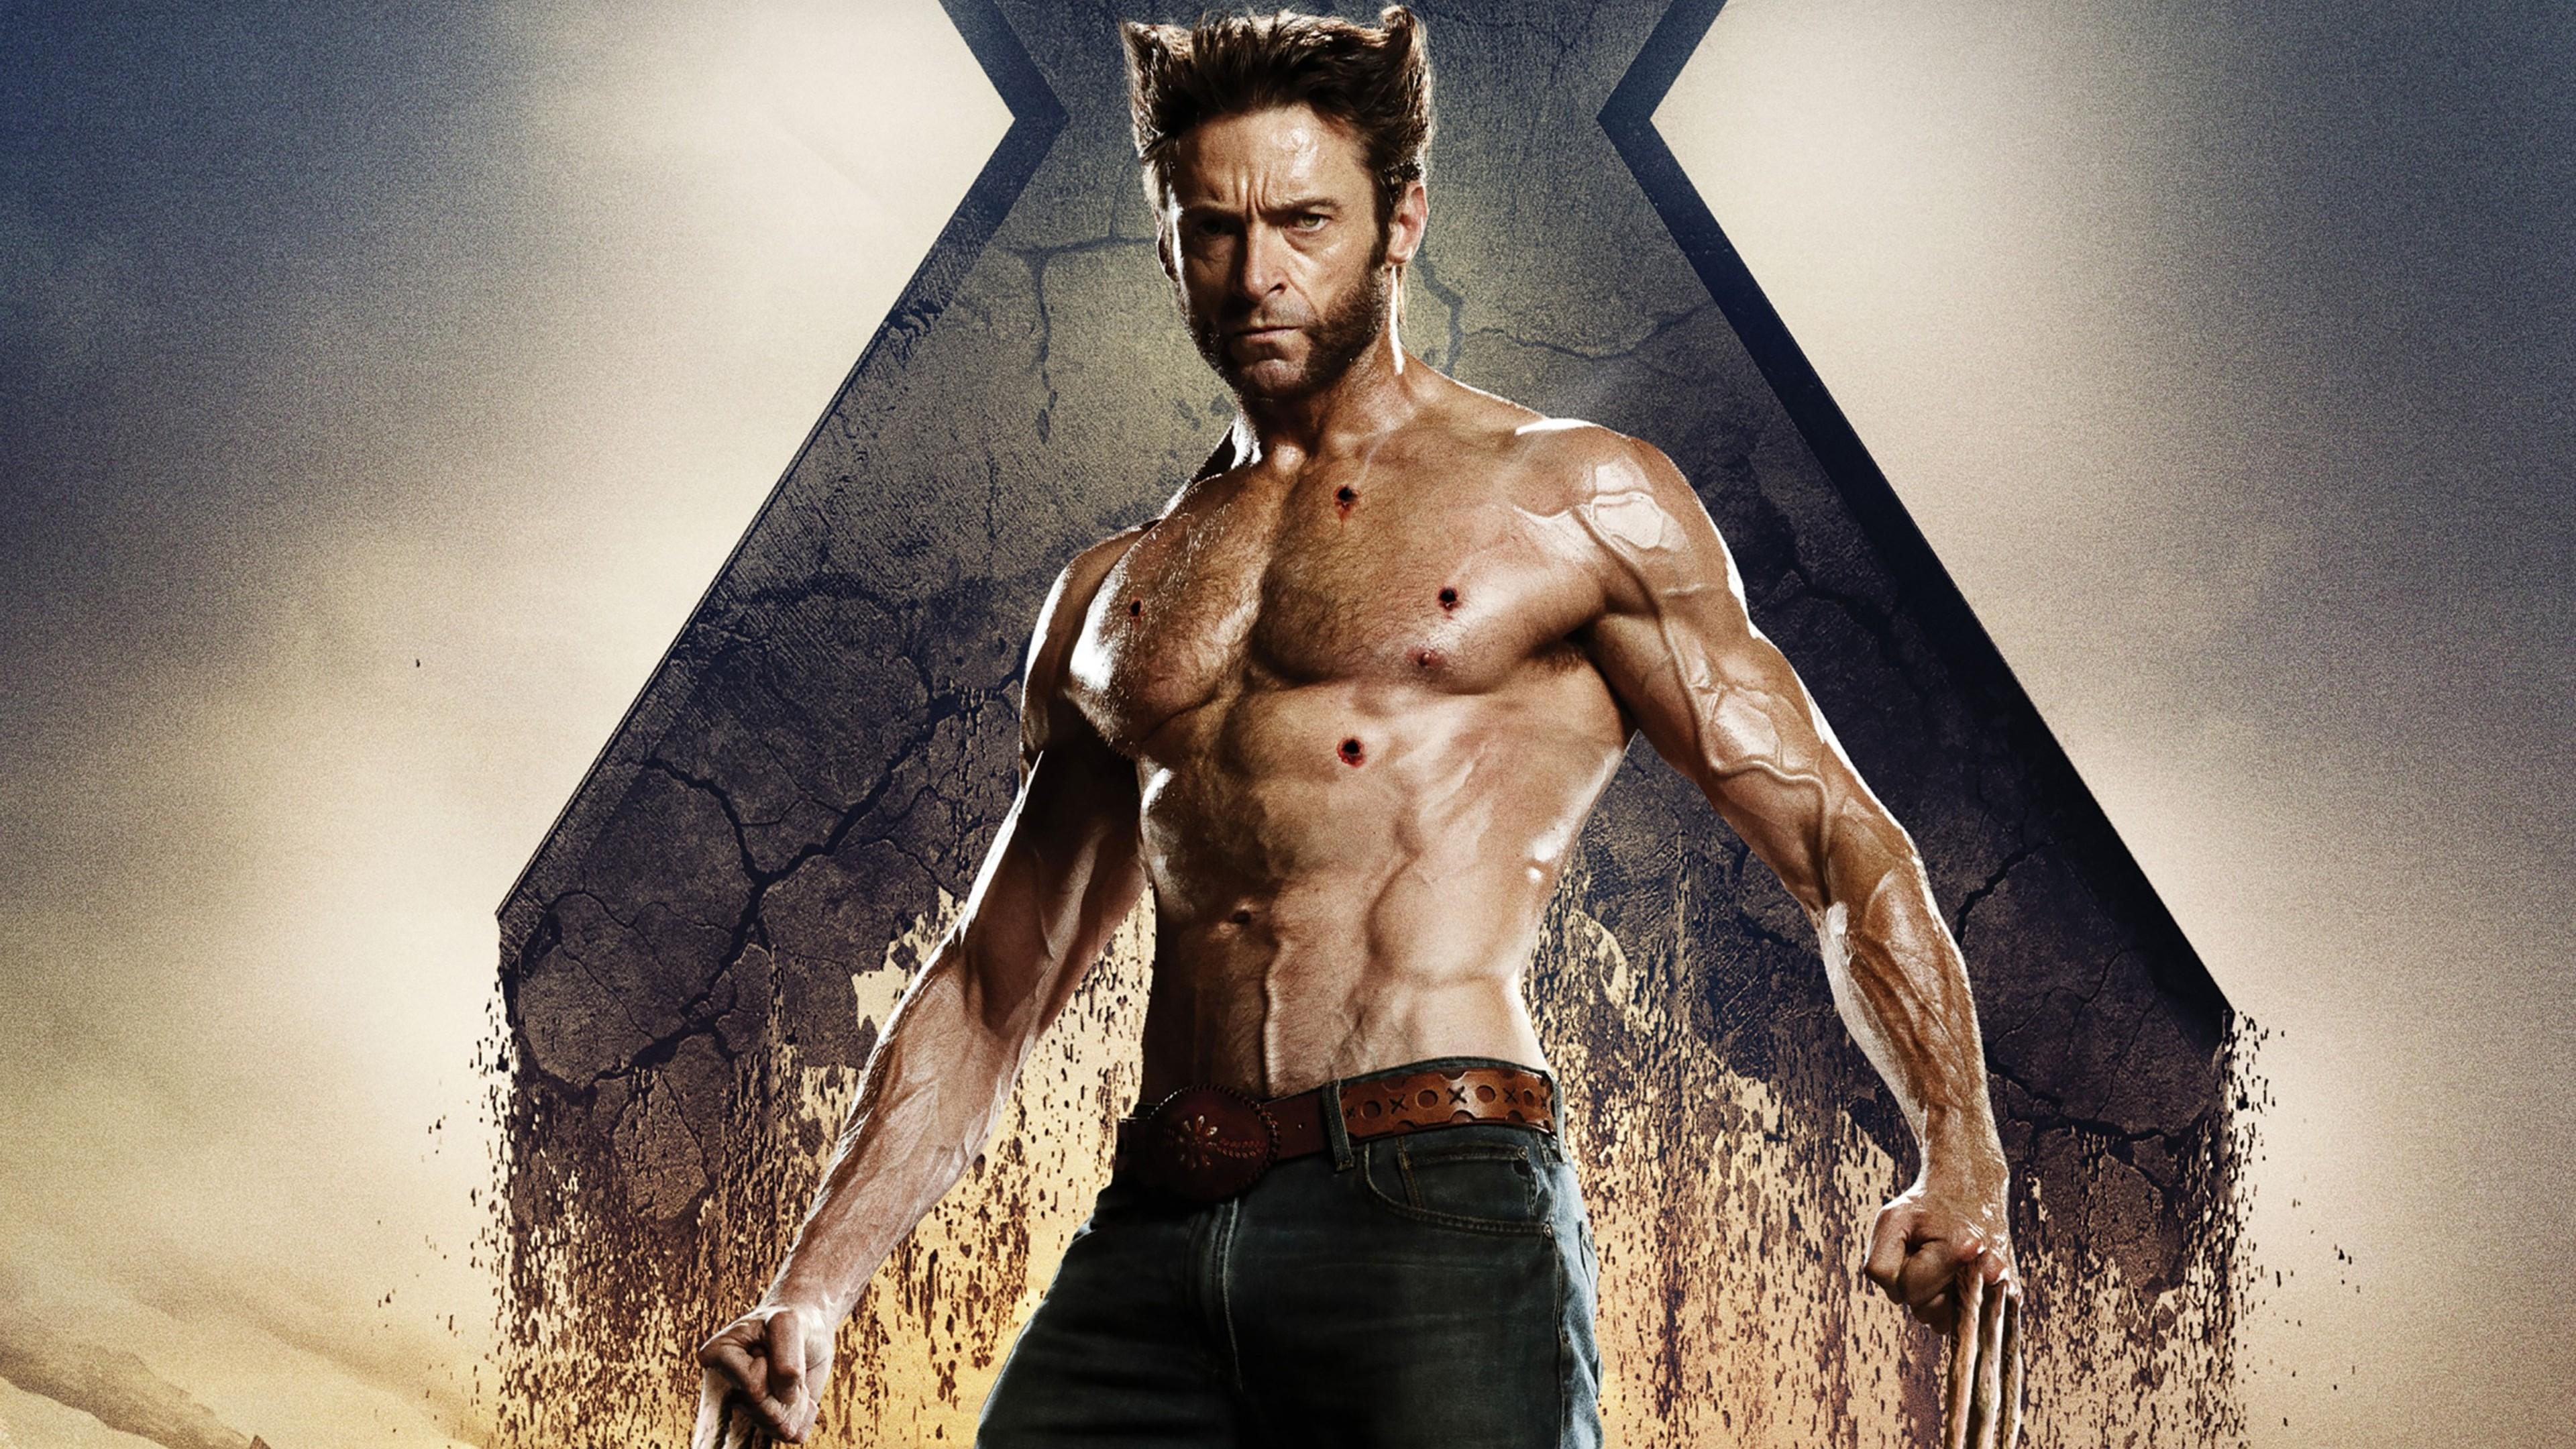 Srk 3d Wallpaper Wolverine In X Men Hd Movies 4k Wallpapers Images